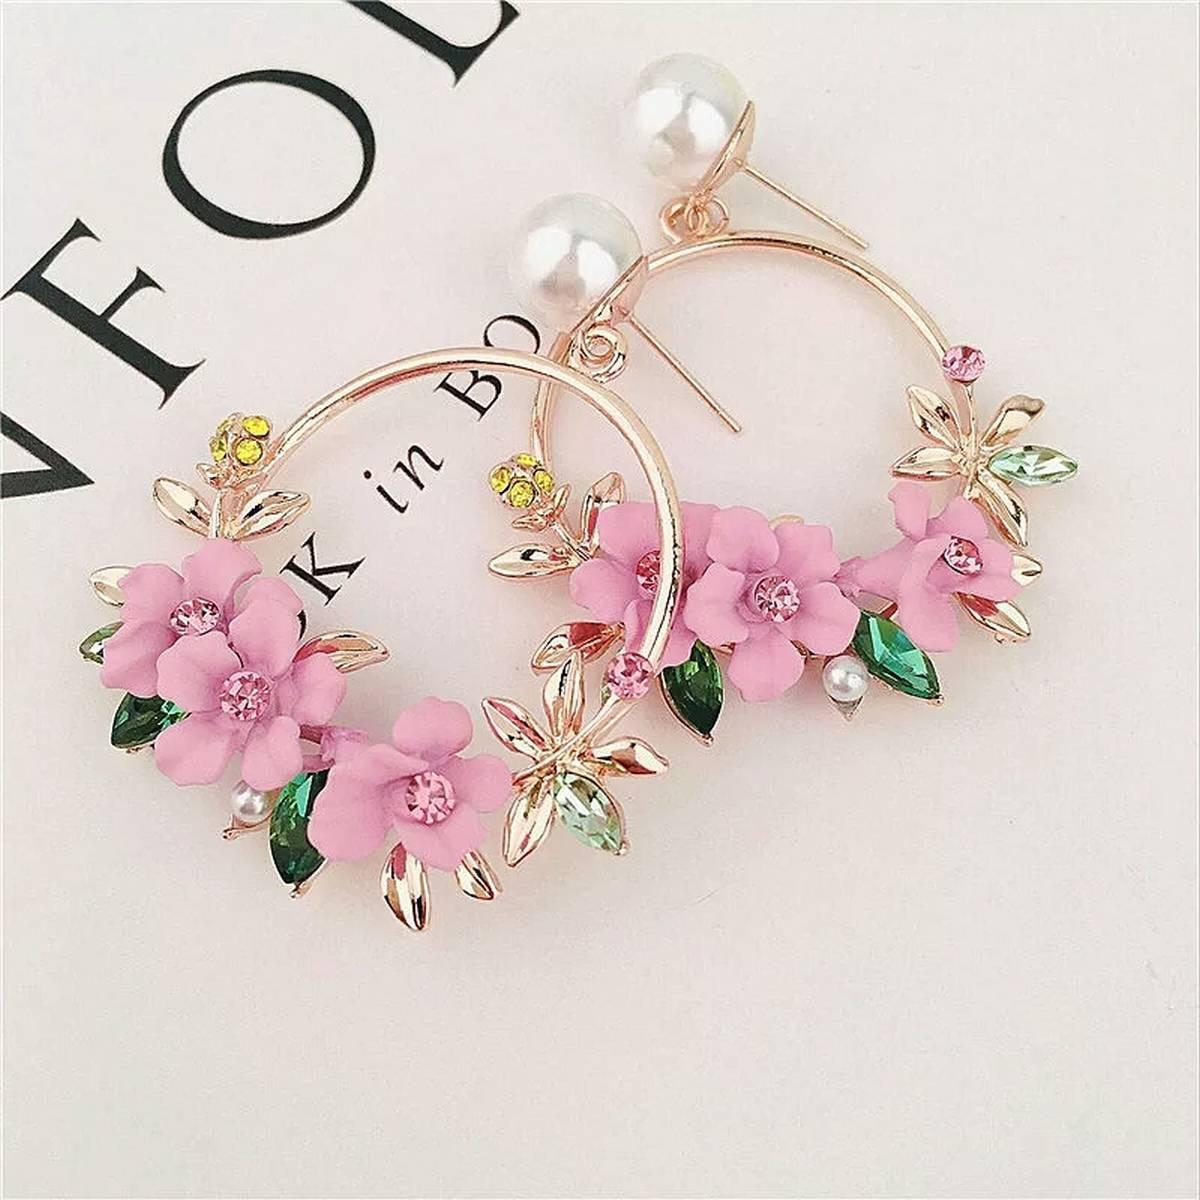 Fashion Trendy Earrings Flowers Drop Earrings For Women Vintage Pink Temperament Contracted Woman Round Earrings Fine Jewelry